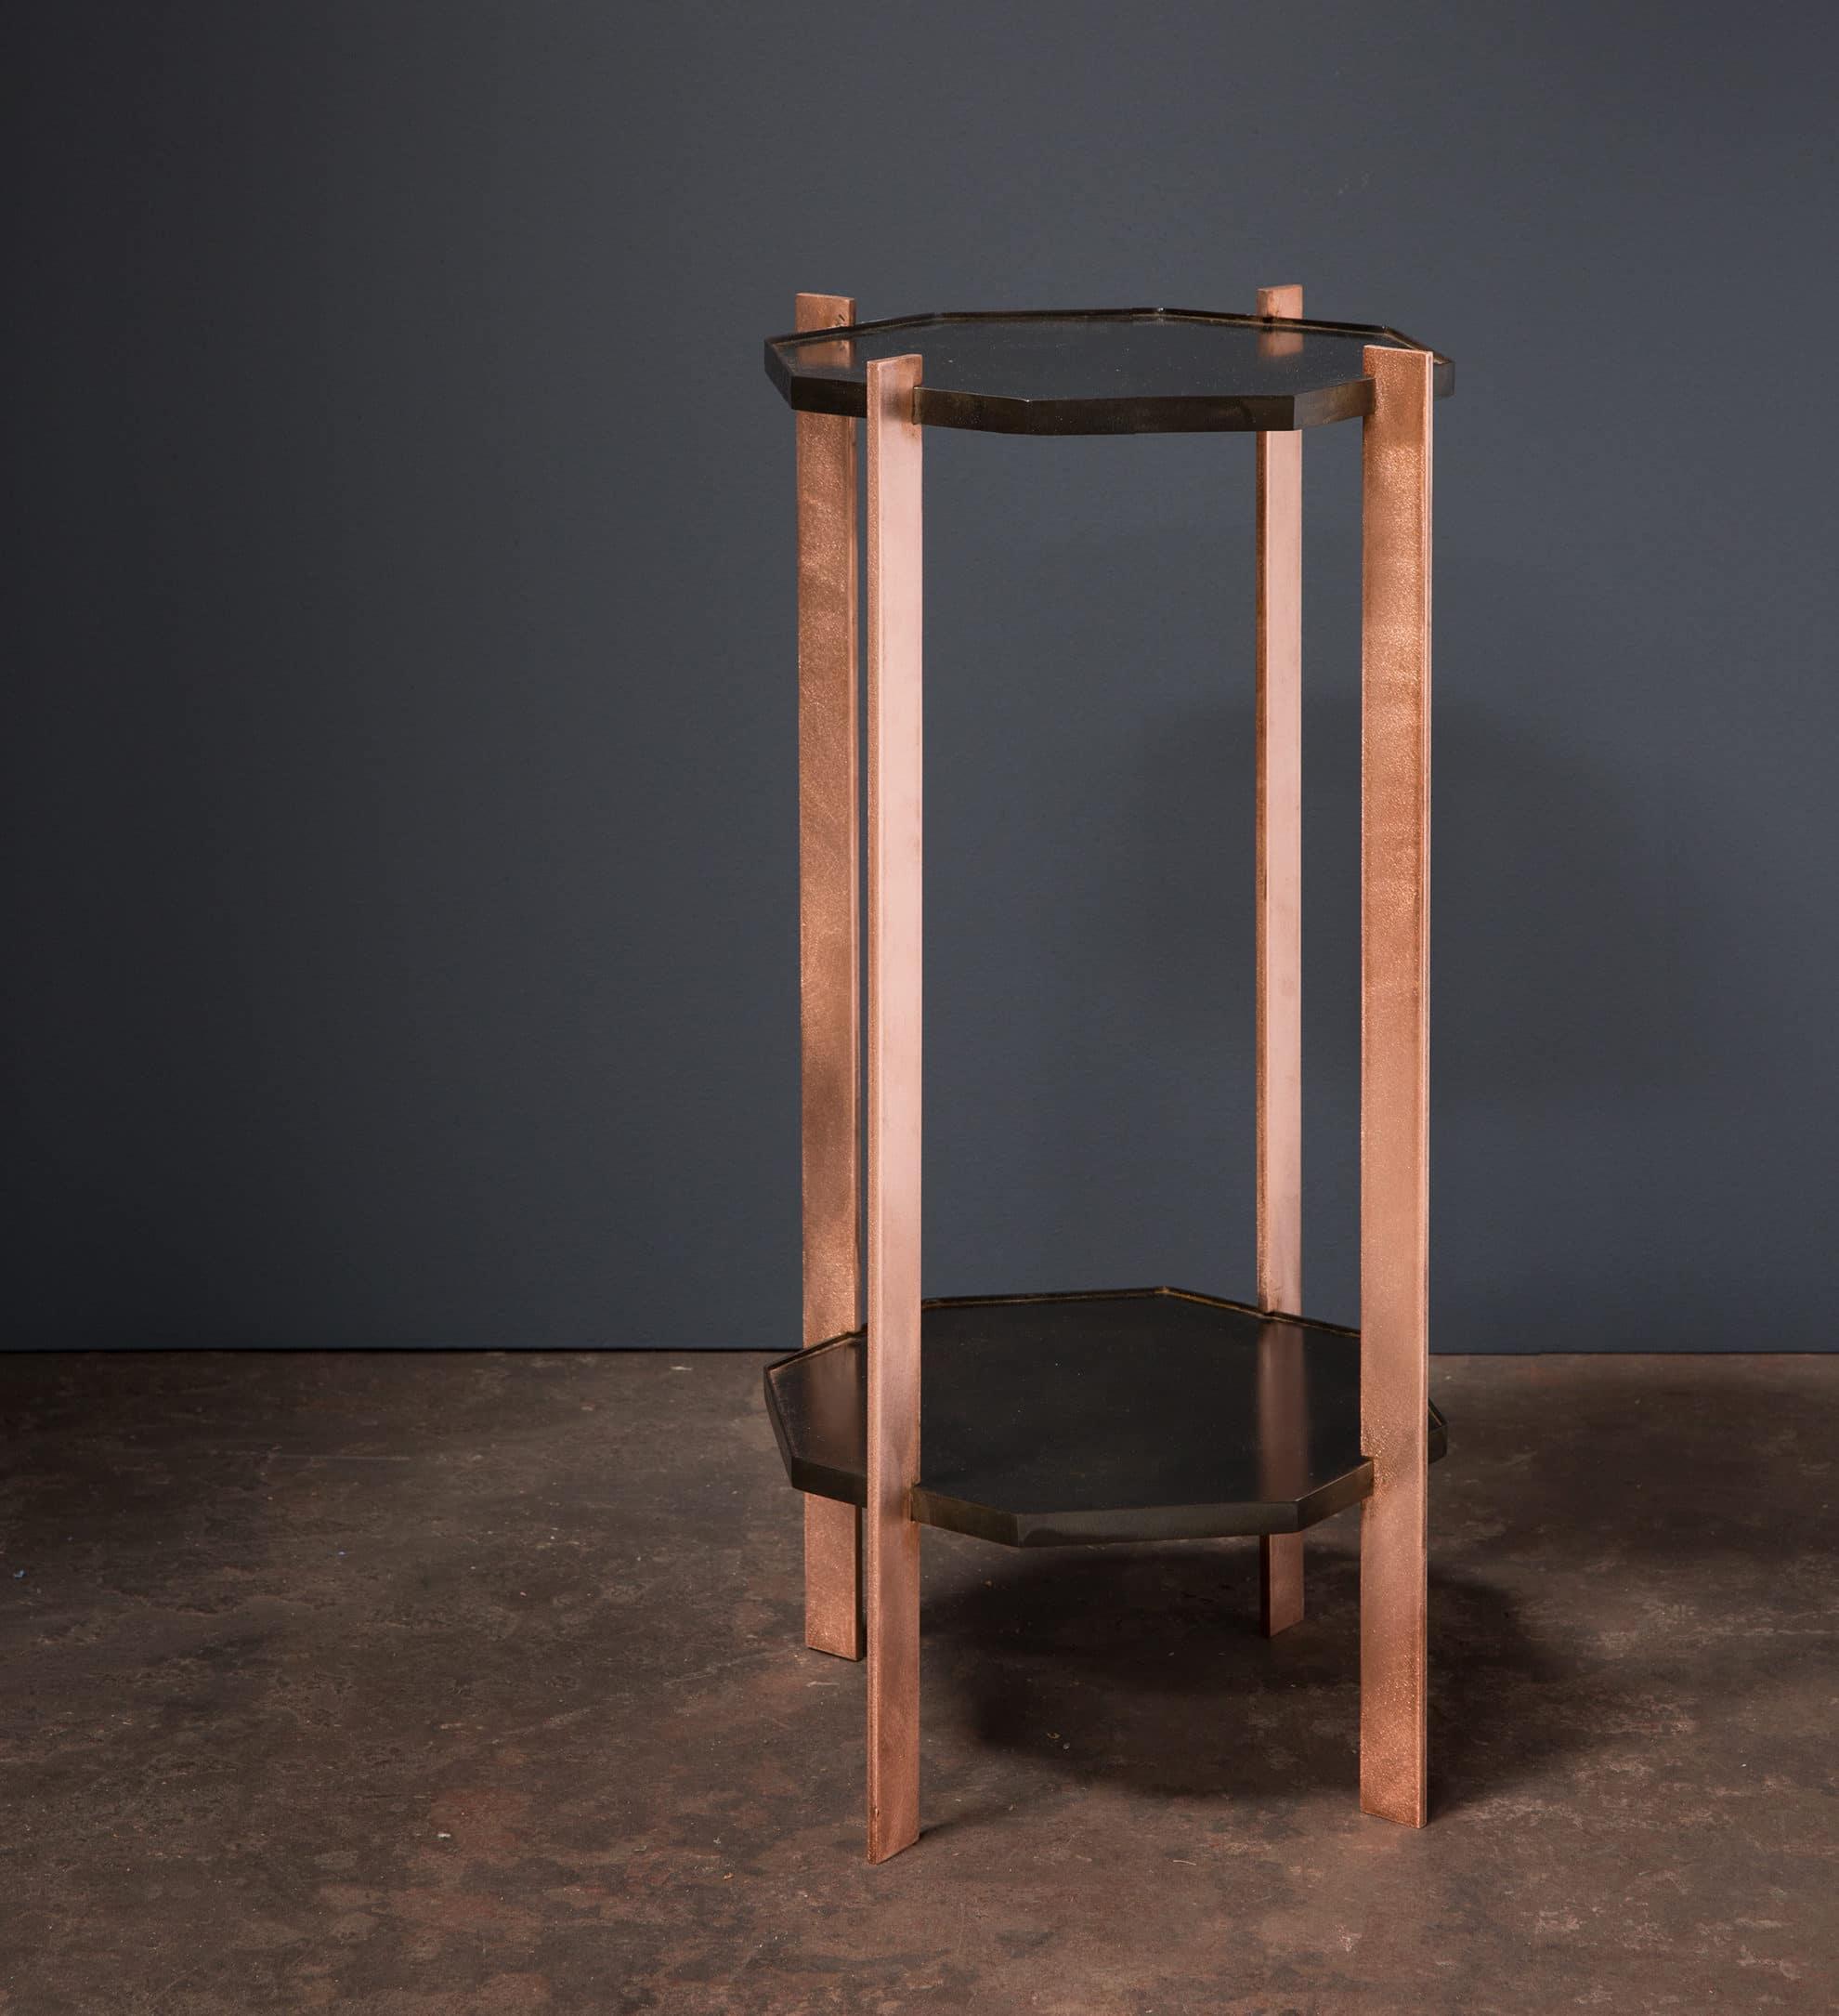 metalic tables copper and steel legs, metal work, metalworker, interior design